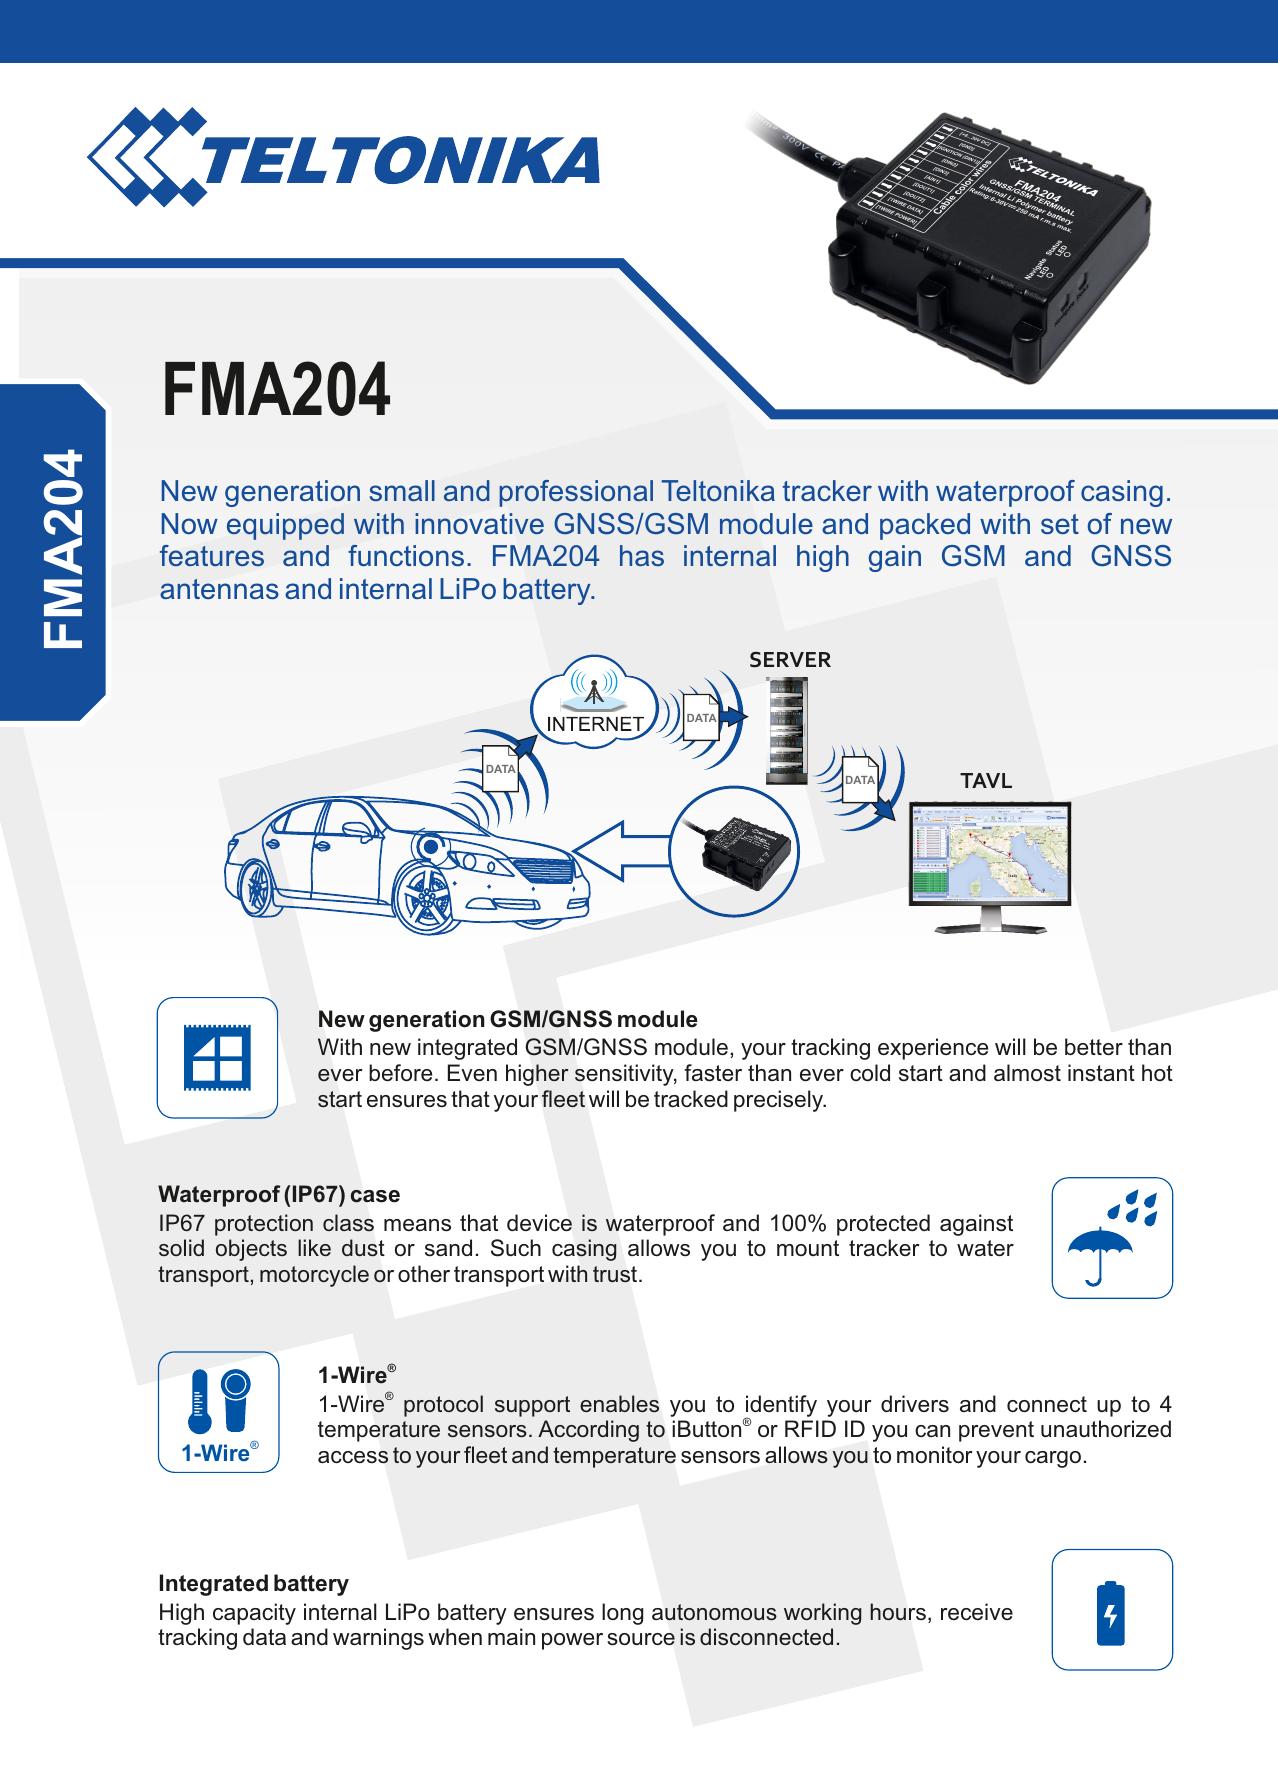 FMA204 - Teltonika | manualzz com